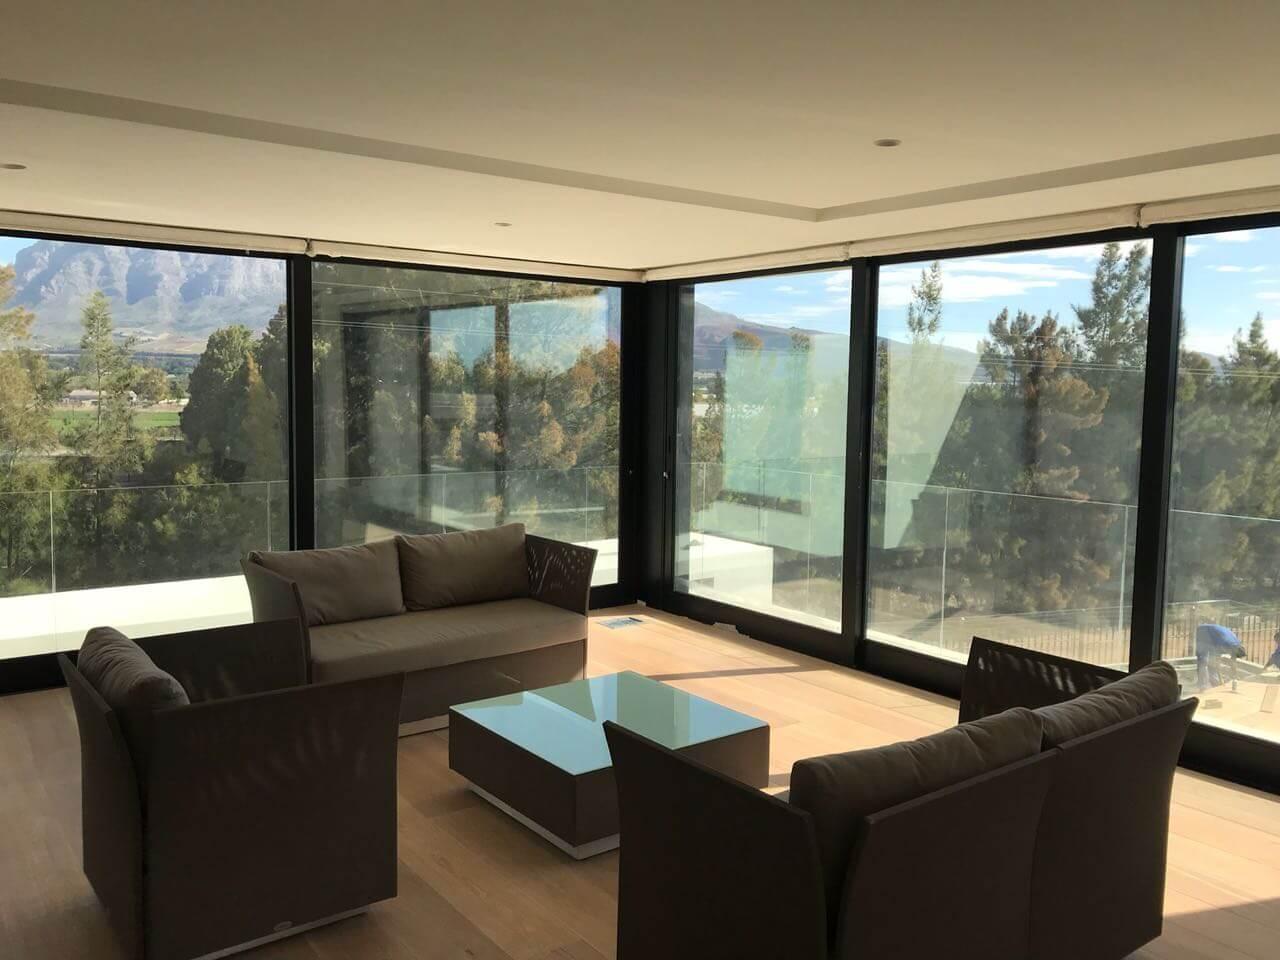 frameless glass windows